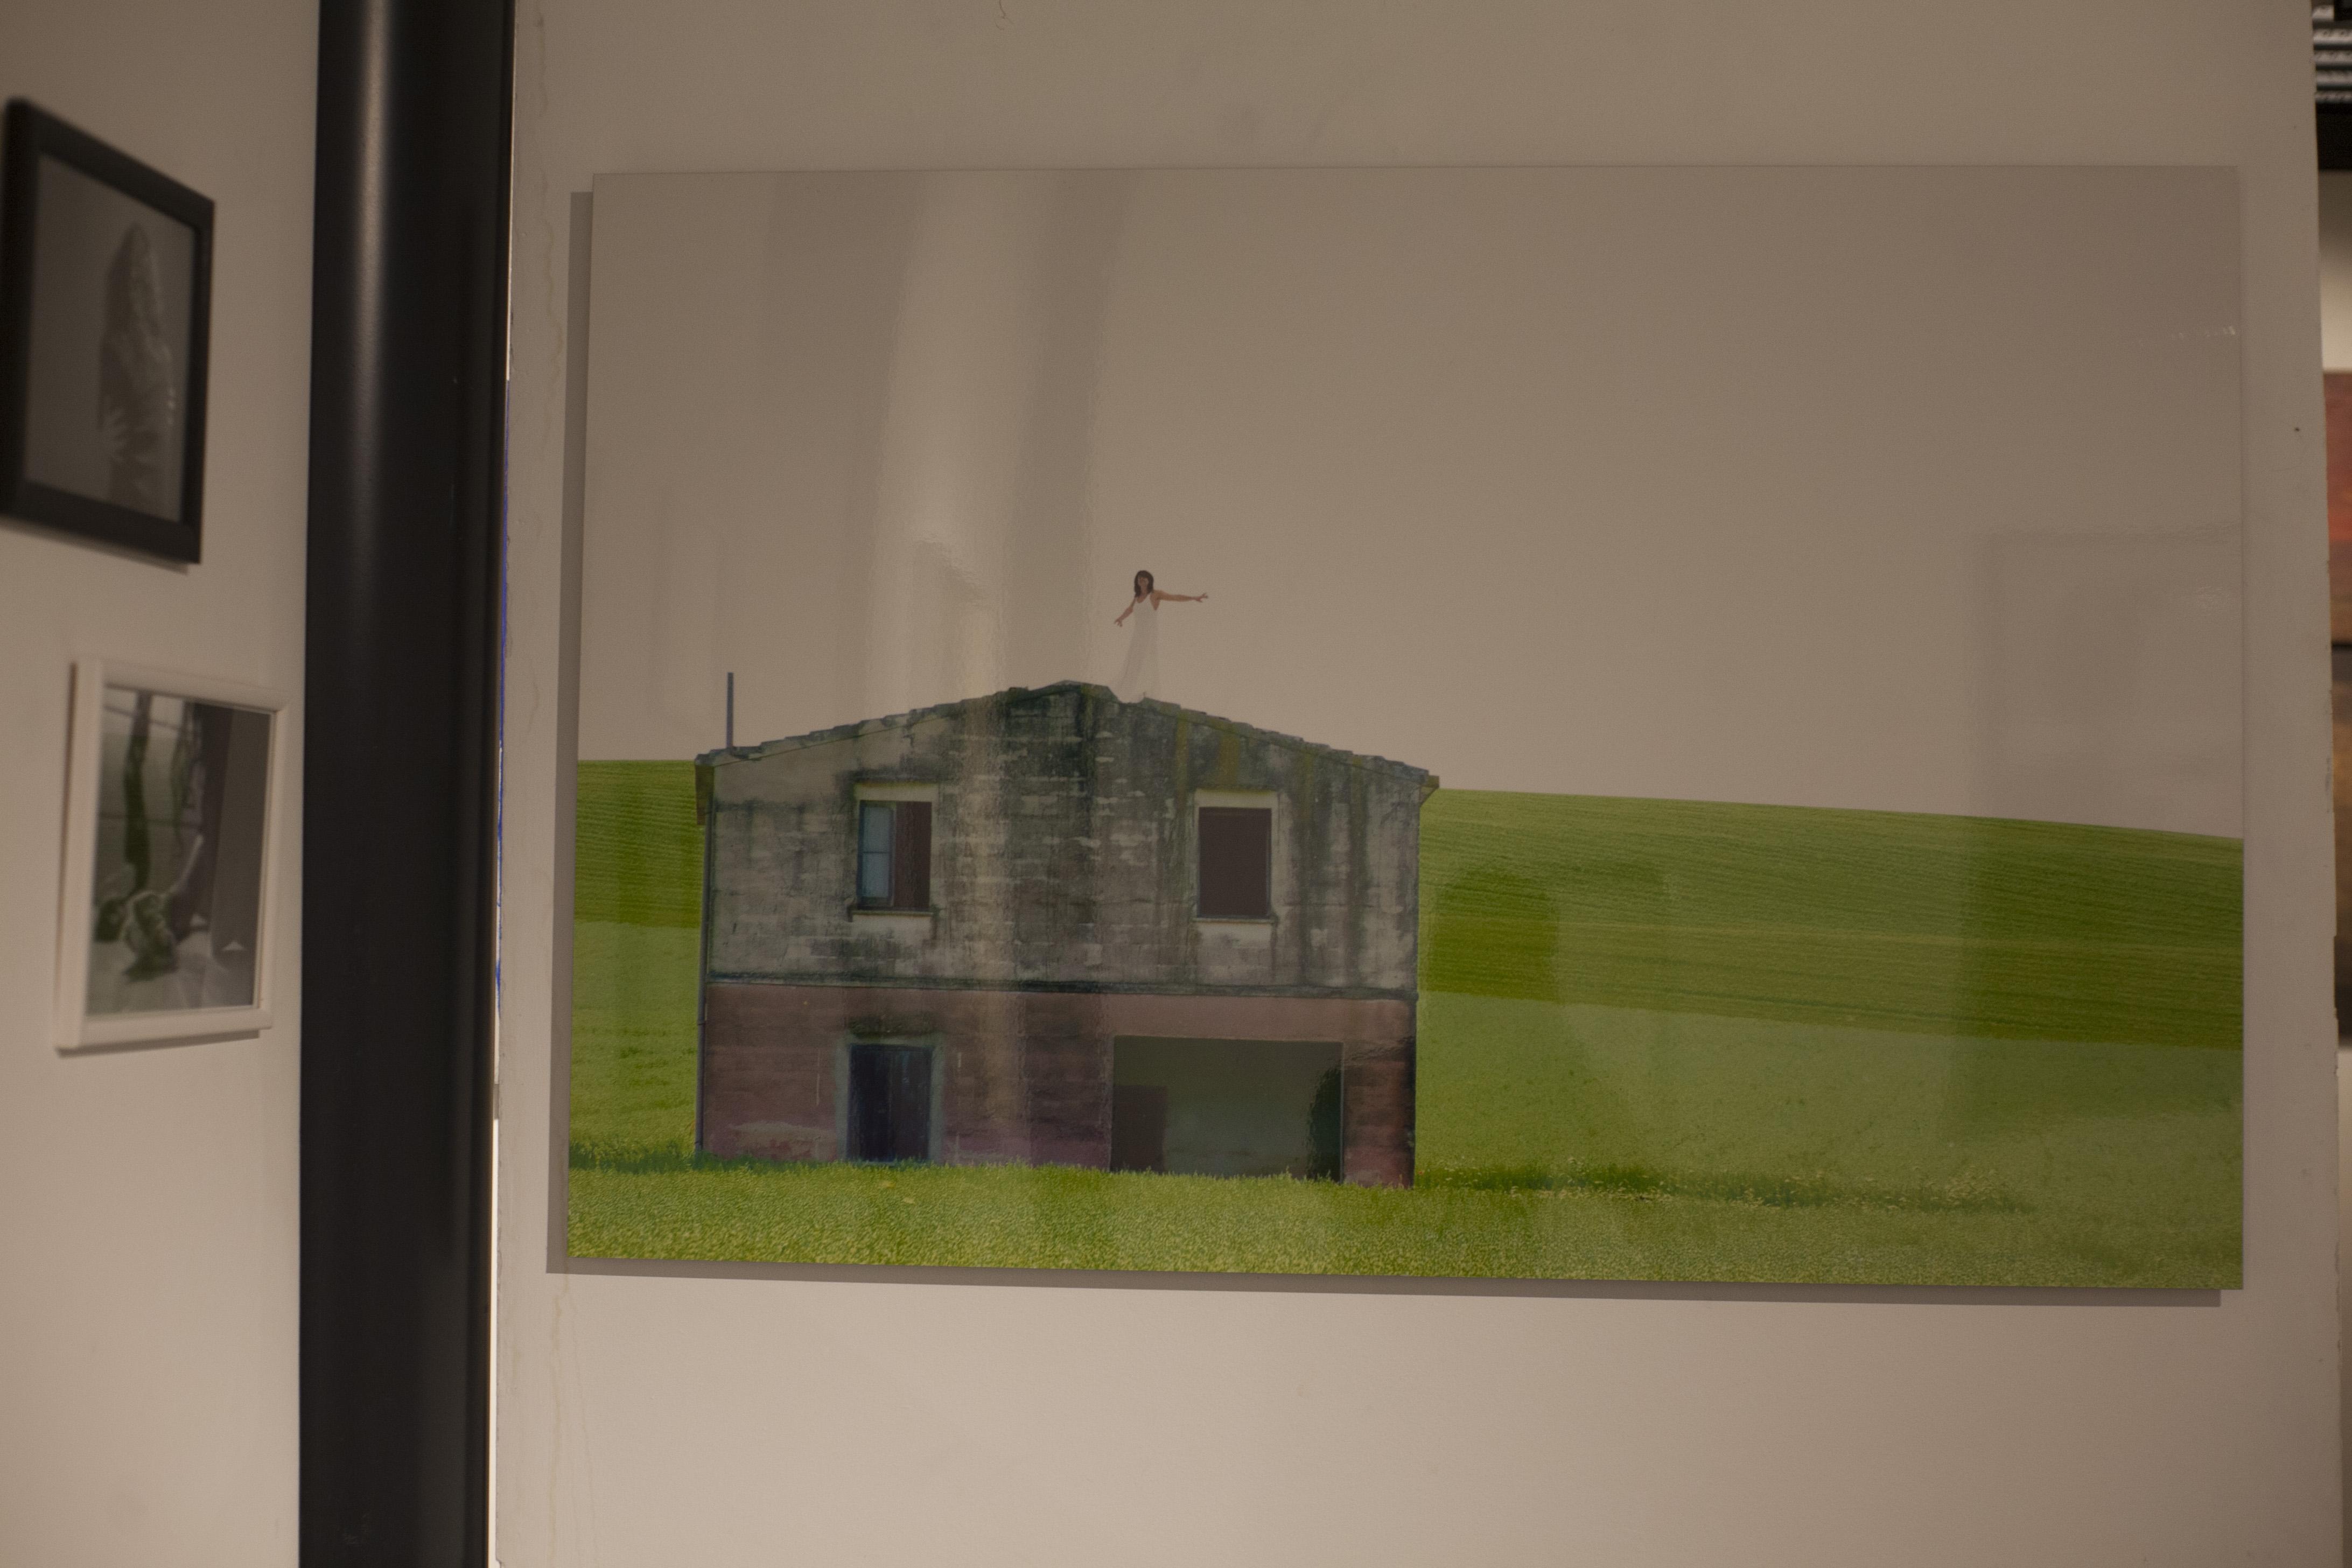 Untitled 2005, Daniela Perego